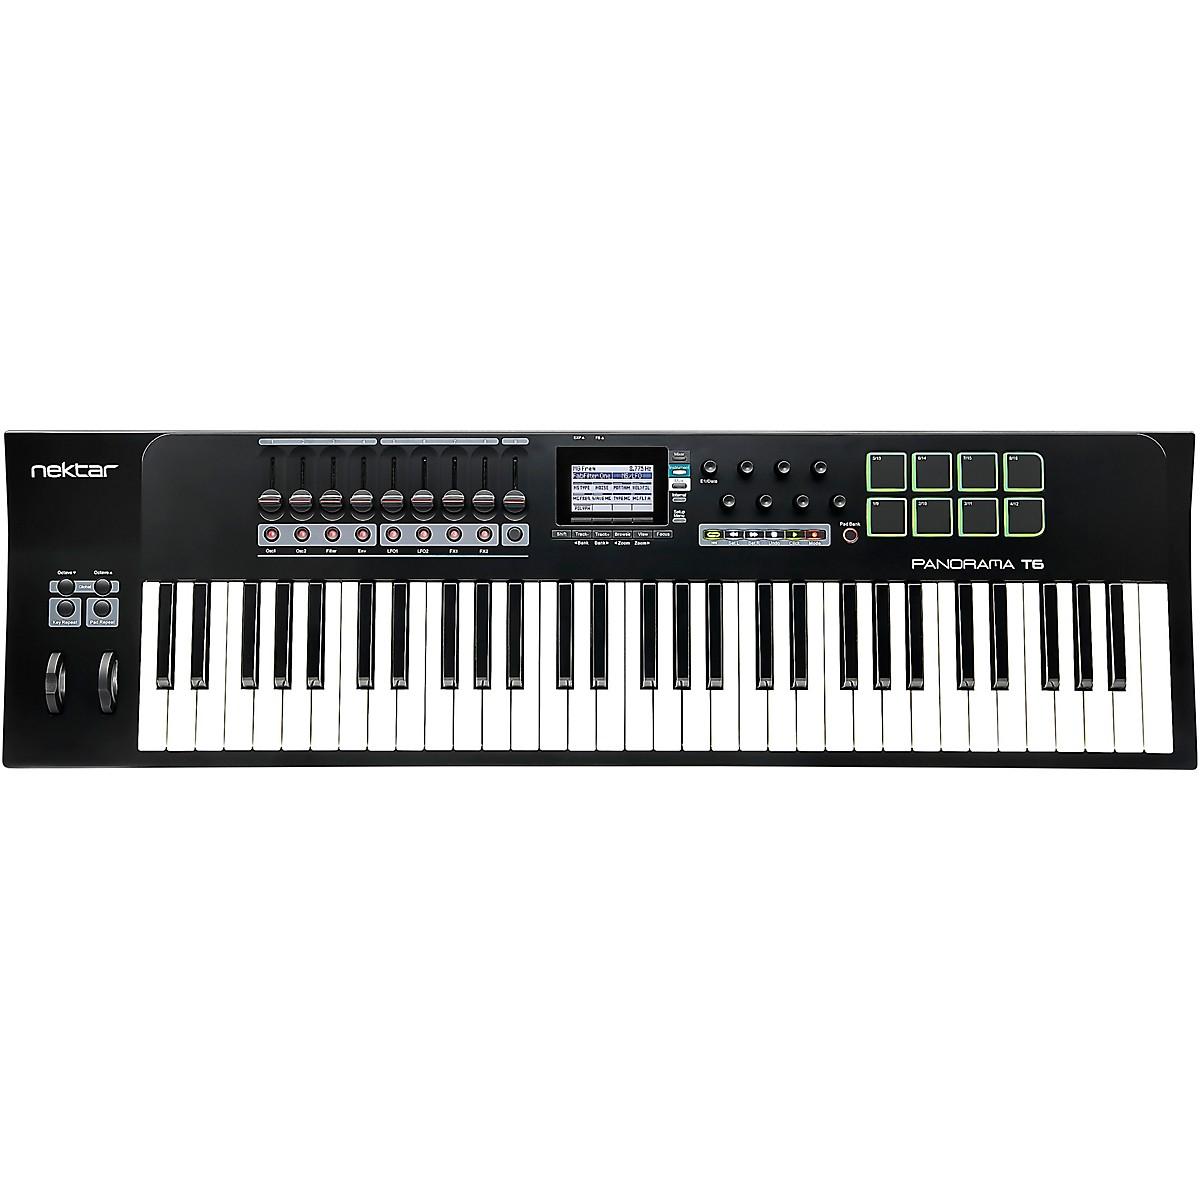 Nektar Panorama T6 61-Key USB MIDI Keyboard Controller